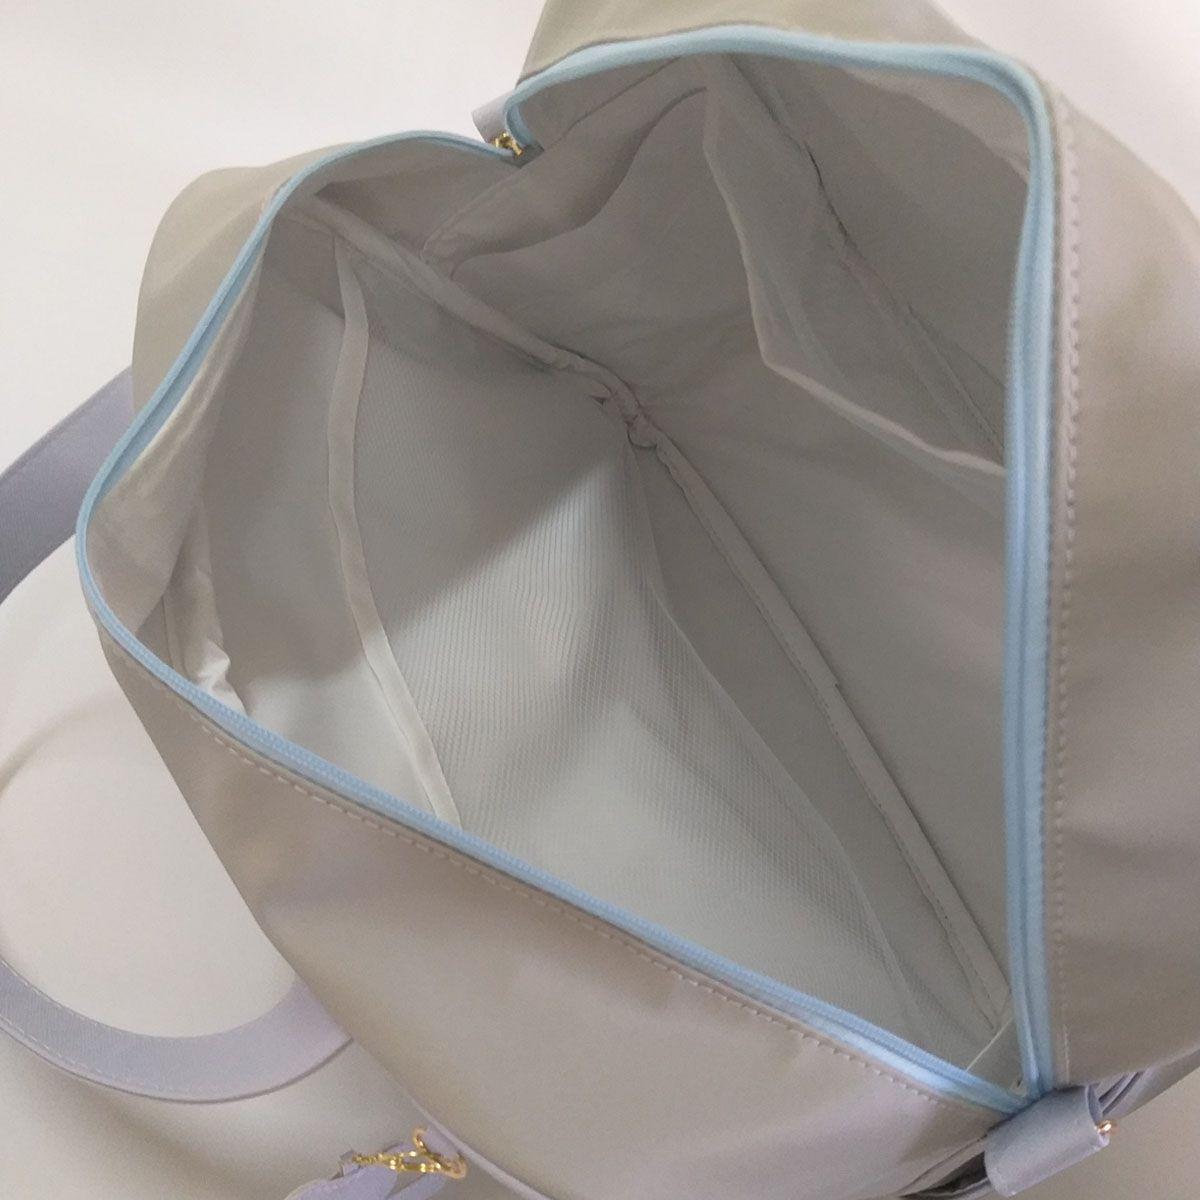 Kit Bolsa Maternidade + Mala Maternidade Cinza com Azul